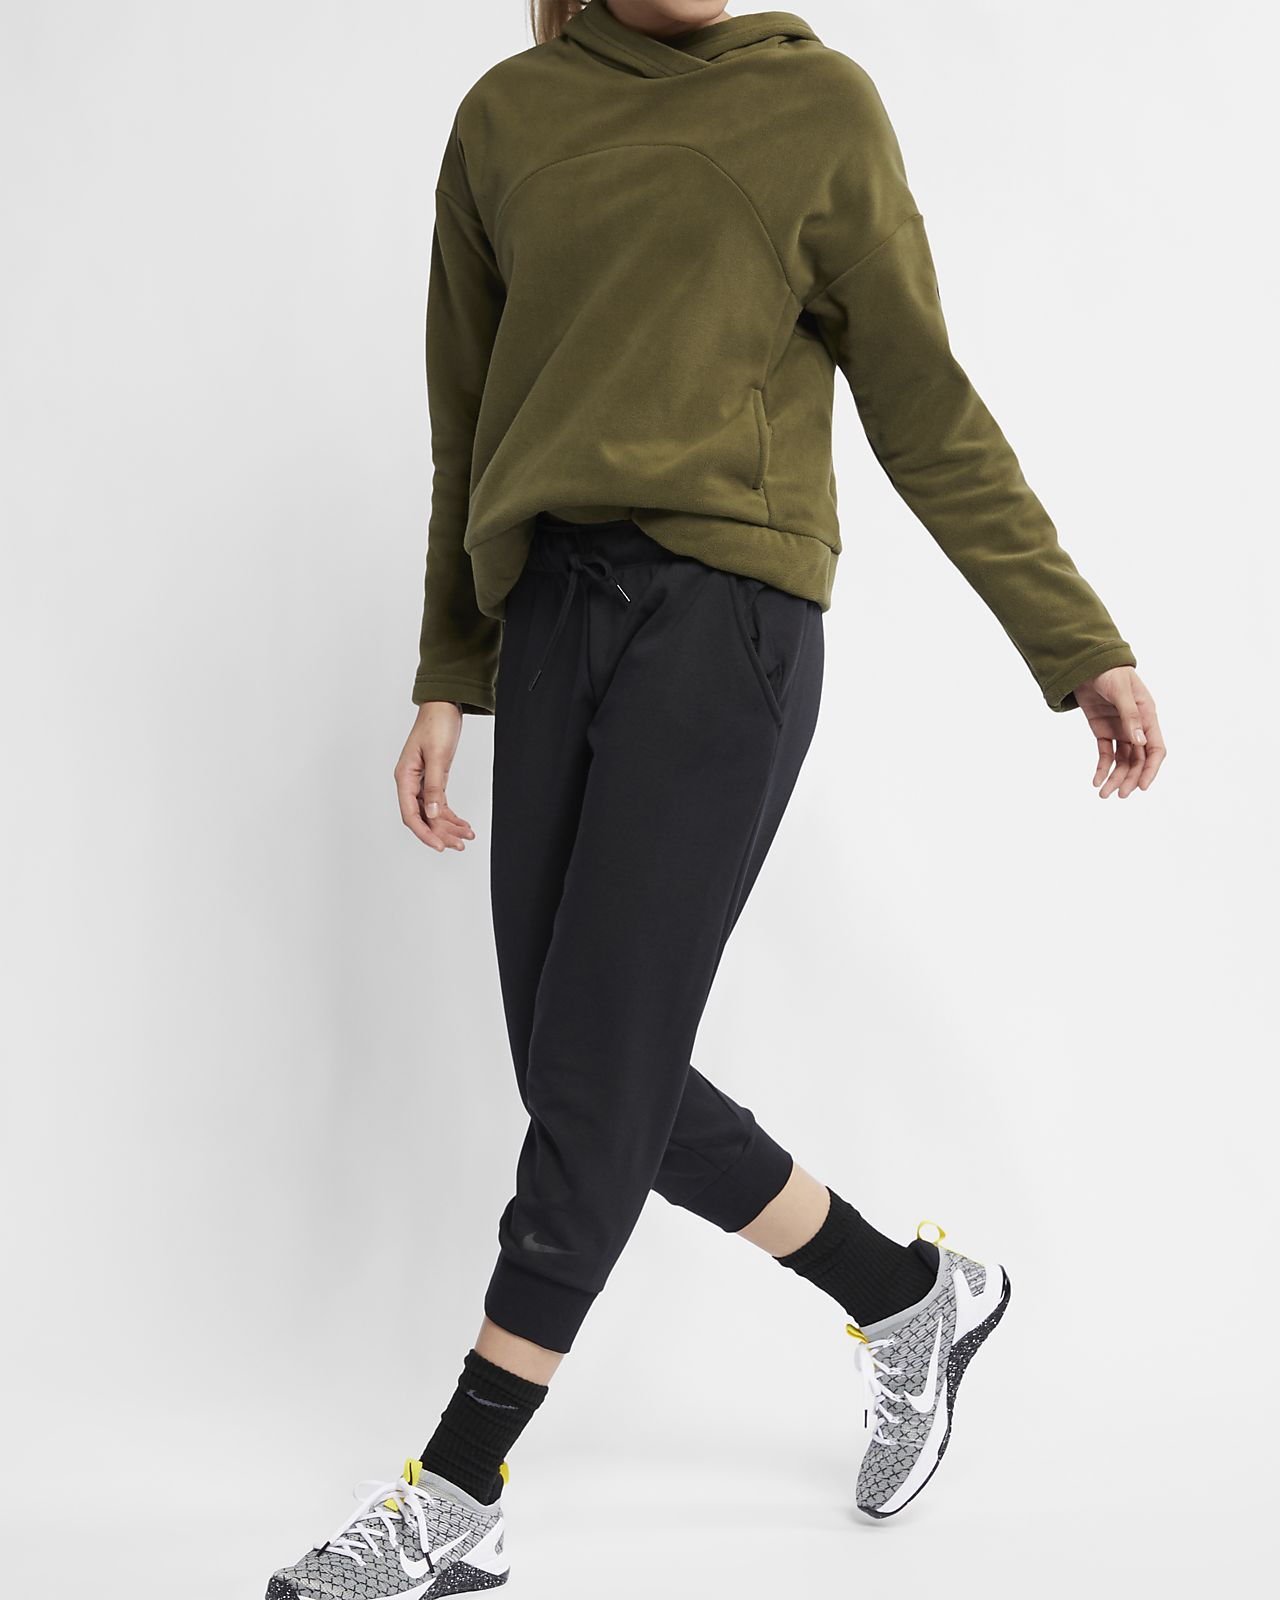 861c9884d707 Nike Dri-FIT Endurance Women s Training Crops. Nike.com